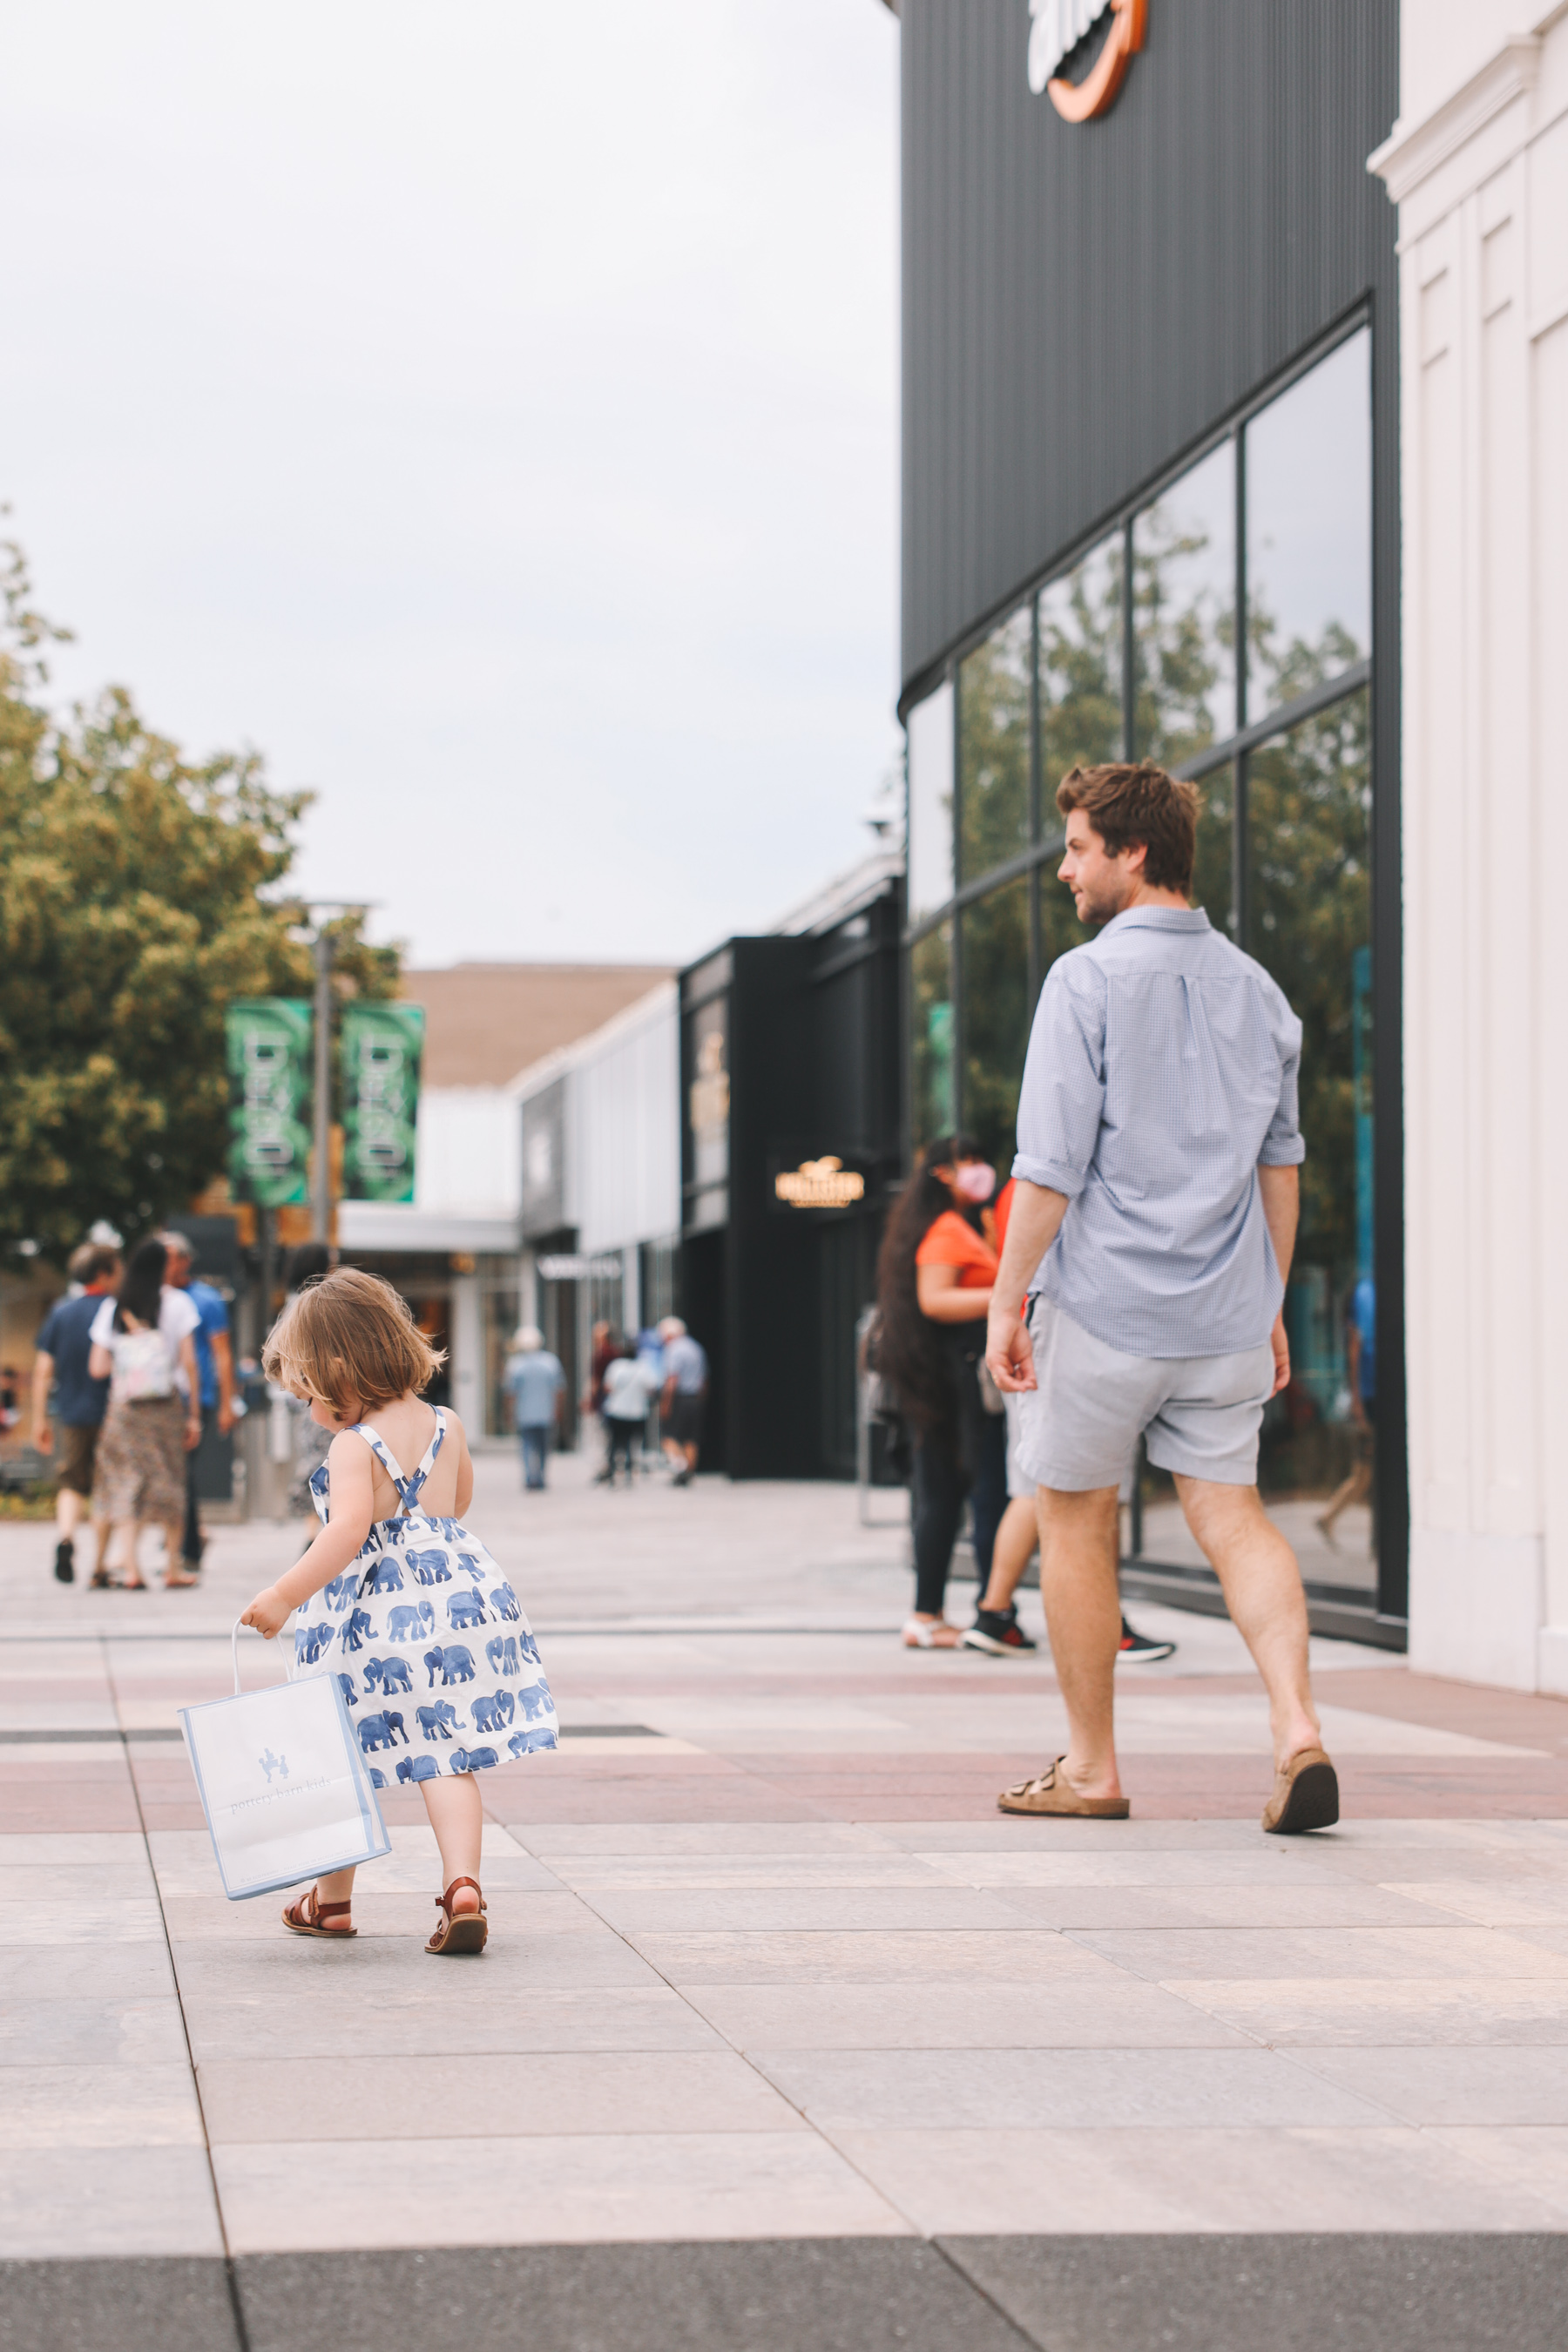 Oakbrook Center outdoor shopping experience